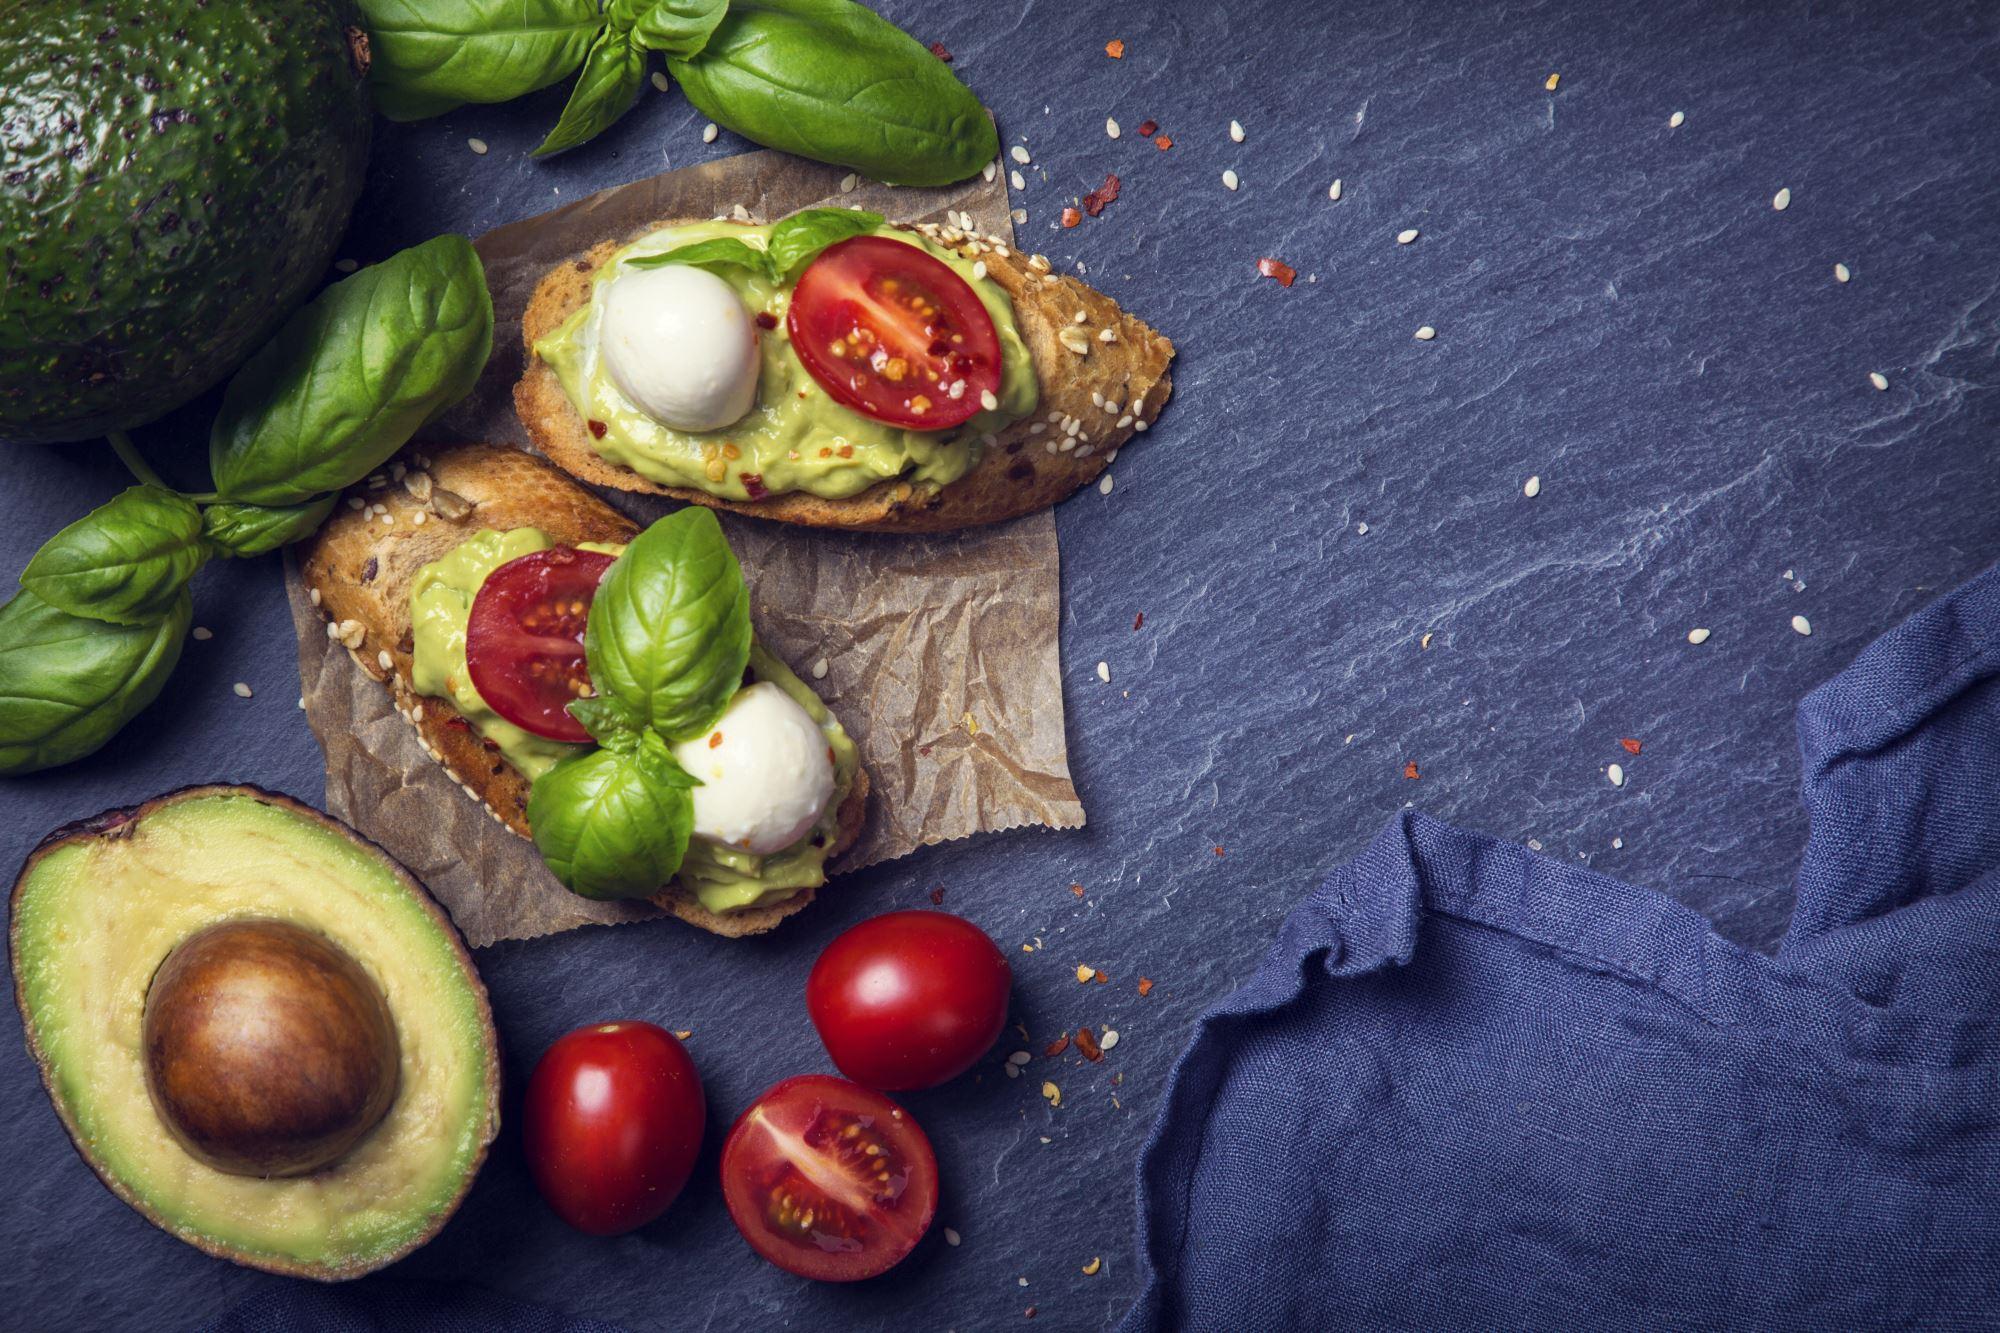 Bruschetta med avocado, cherrytomat og mozzarella